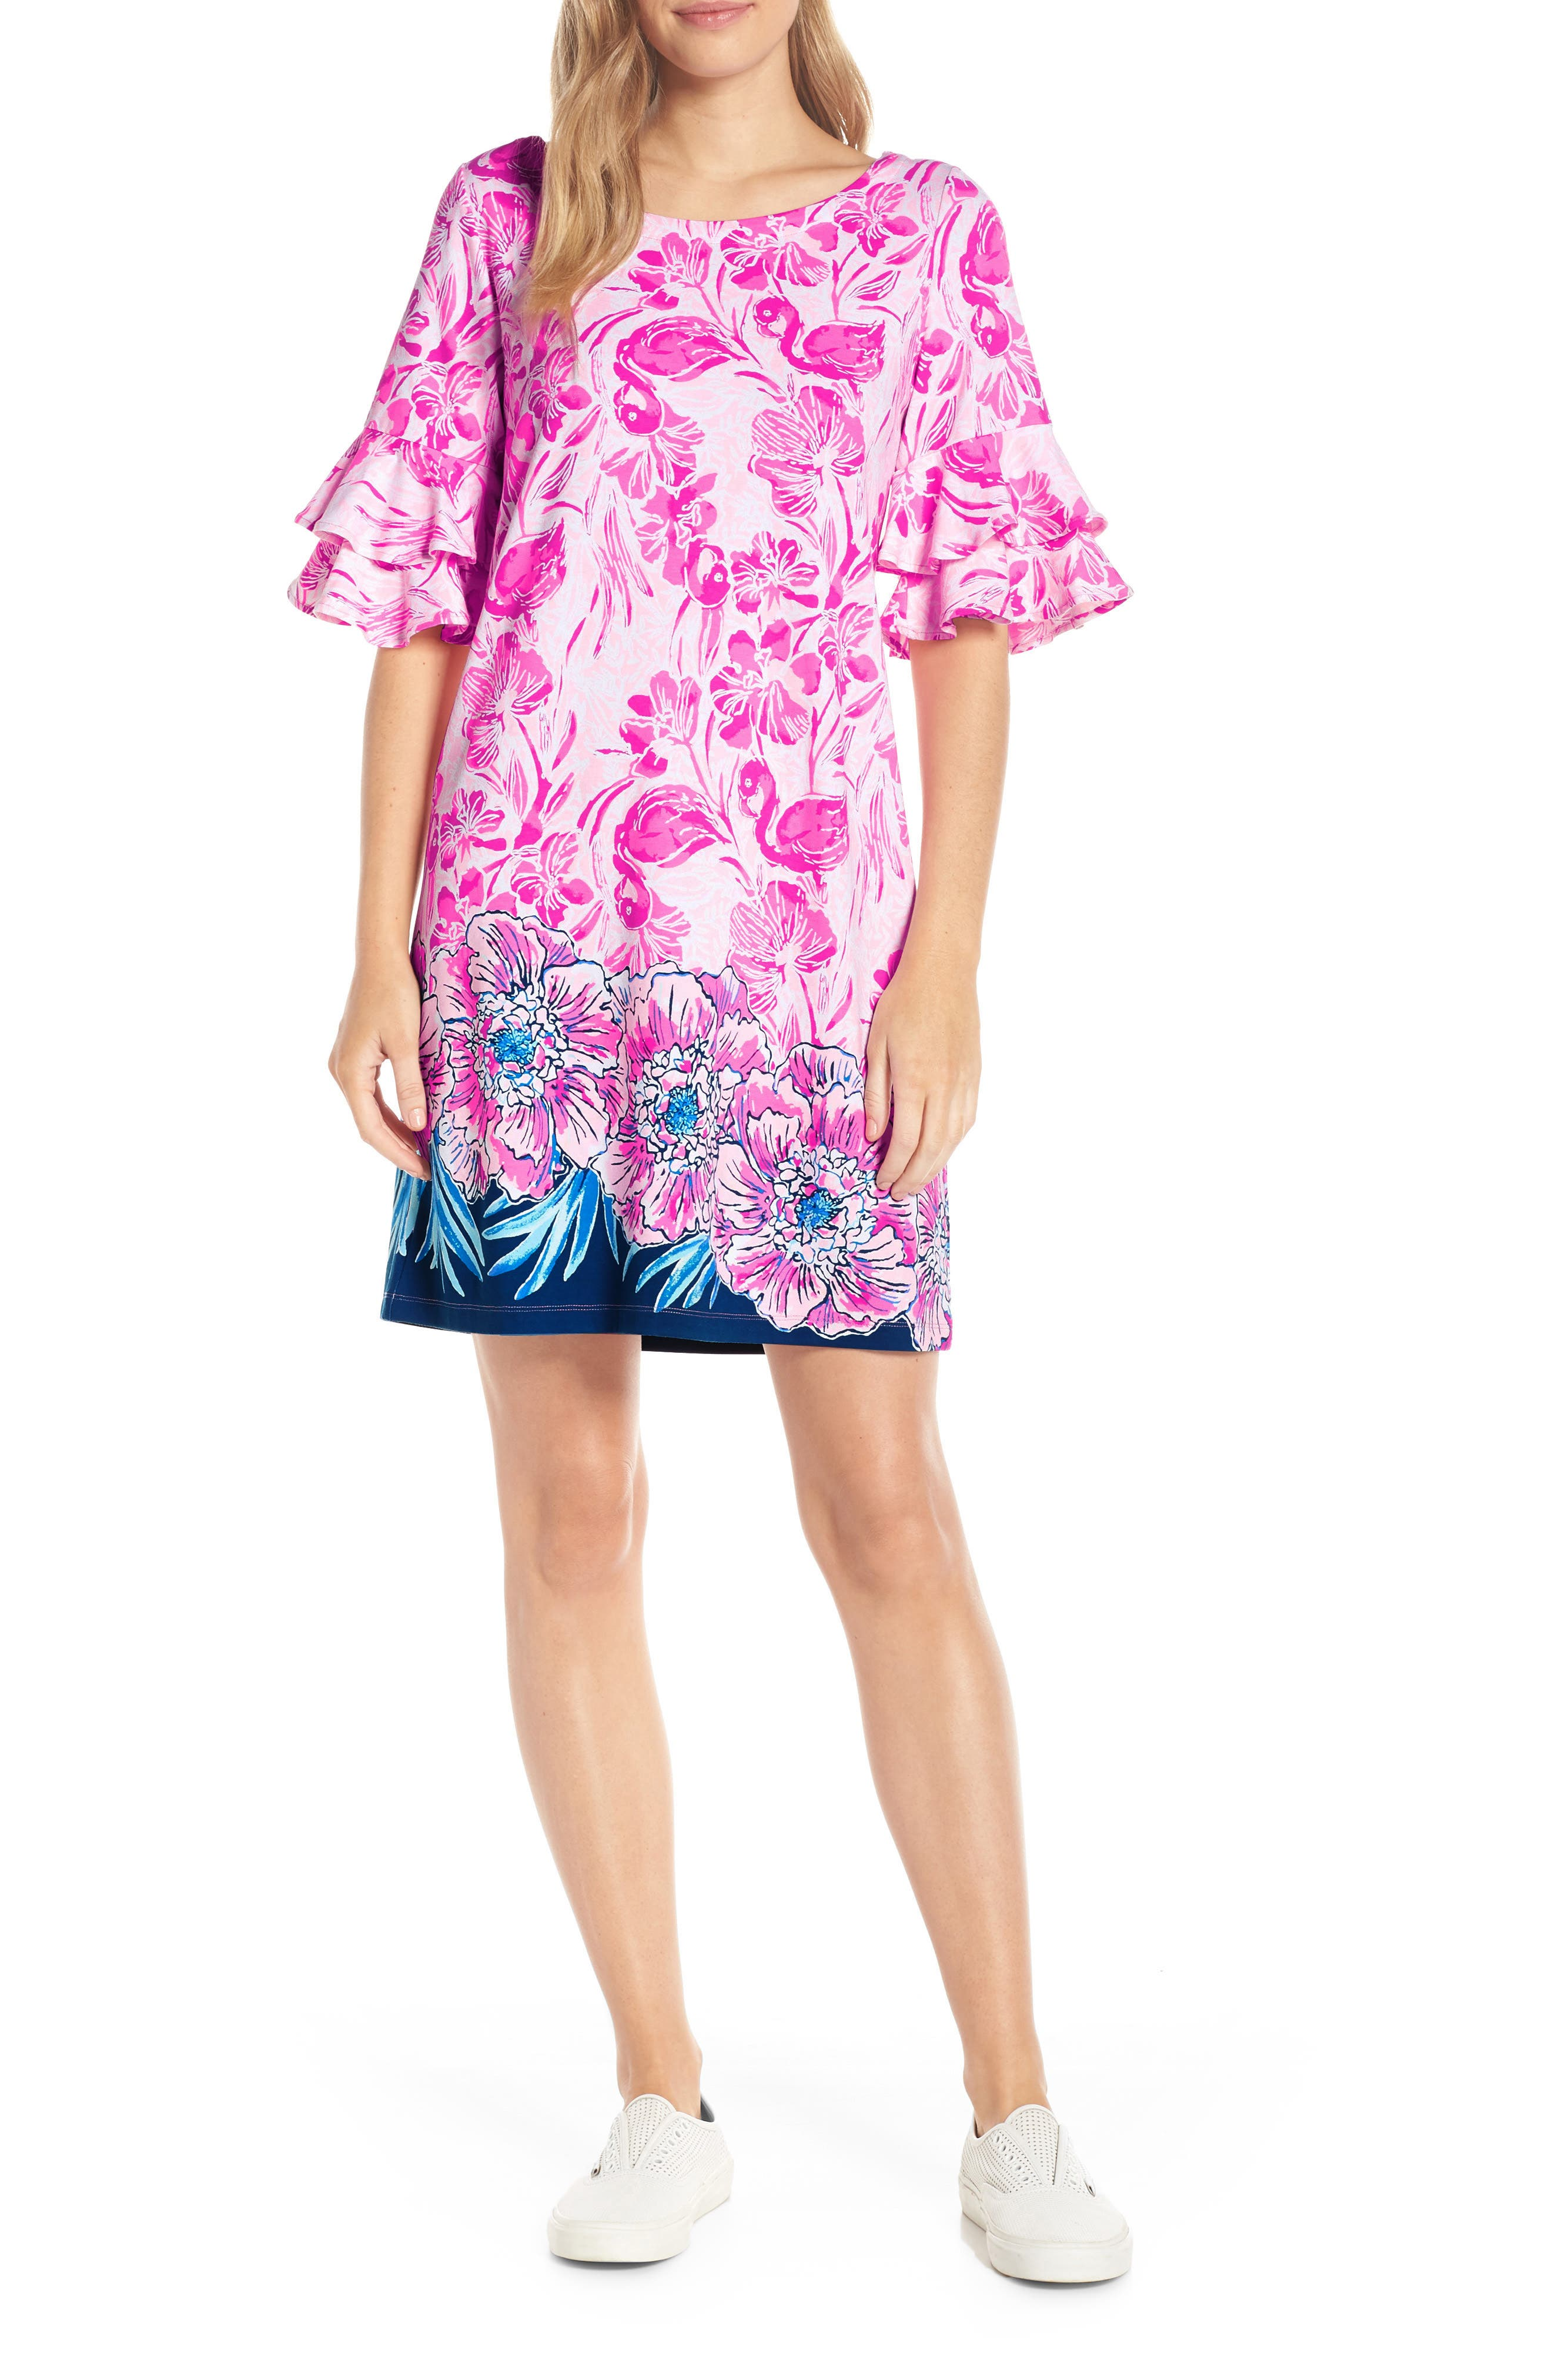 Lilly Pulitzer Lula Shift Dress, Coral